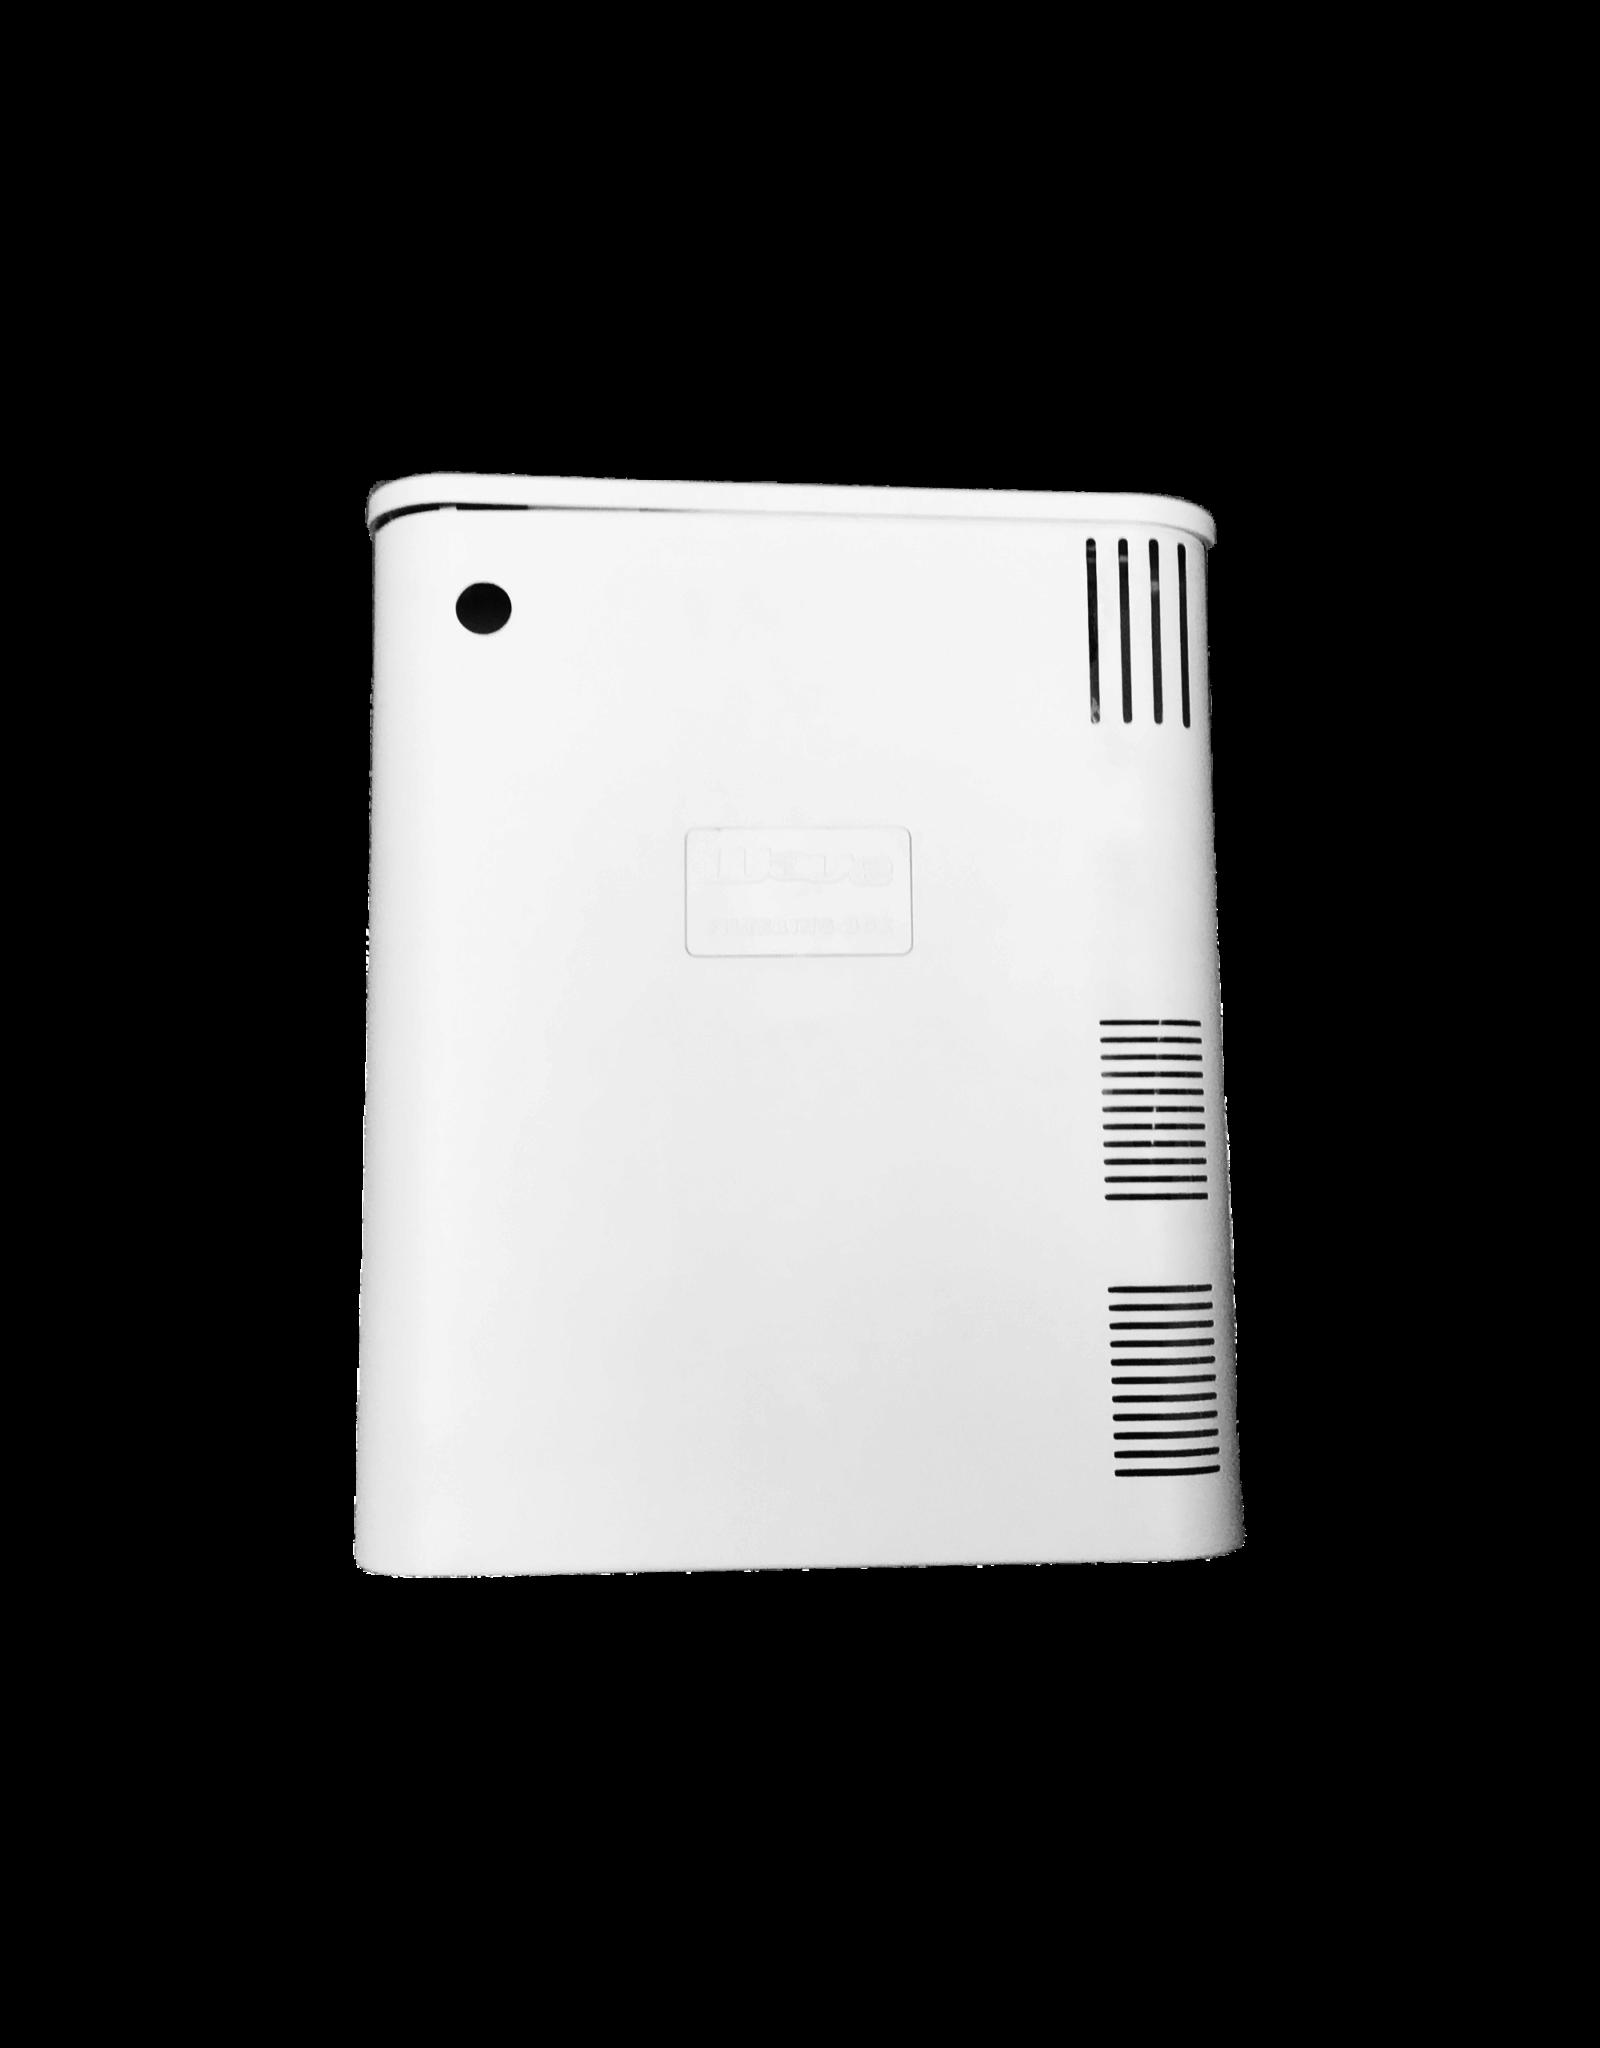 Wave/Amtra Black box 100 - White biological filter